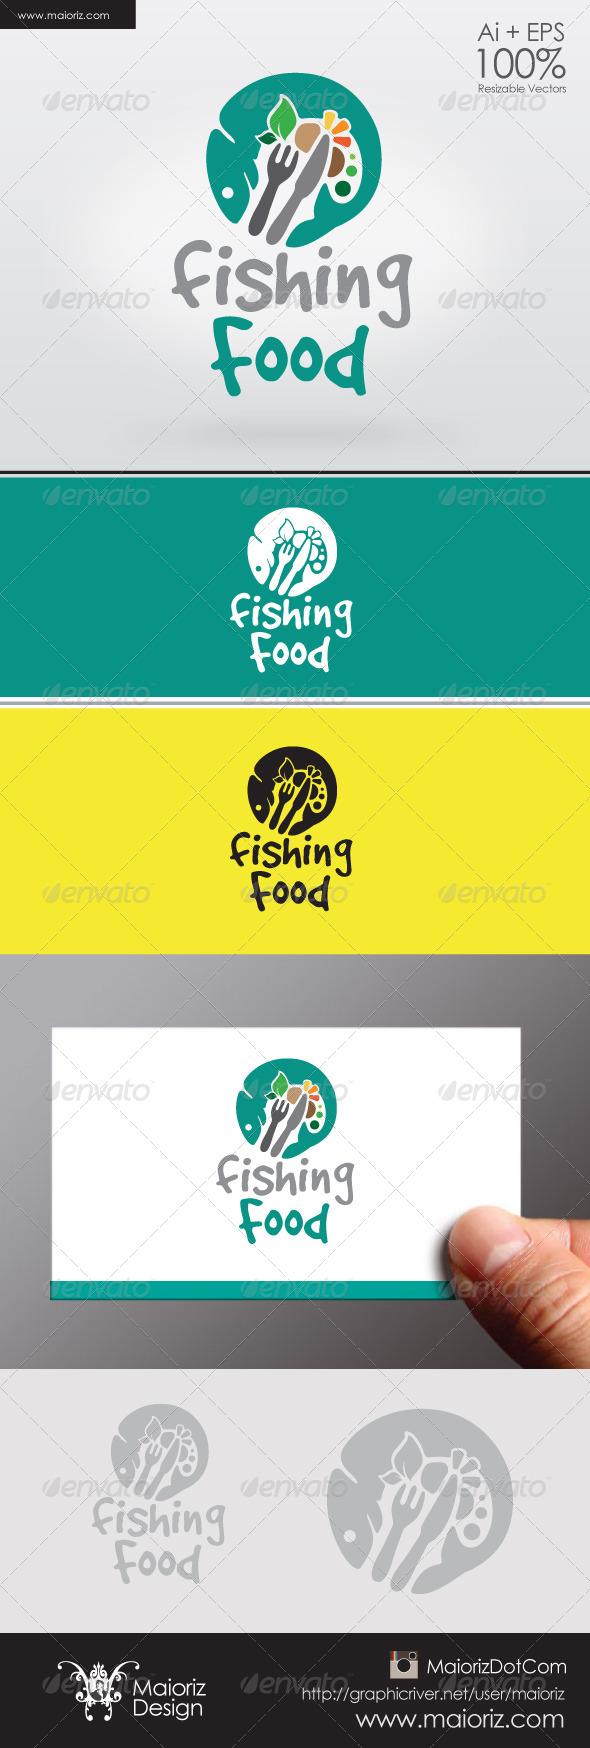 GraphicRiver Fishing Food Logo 6322234